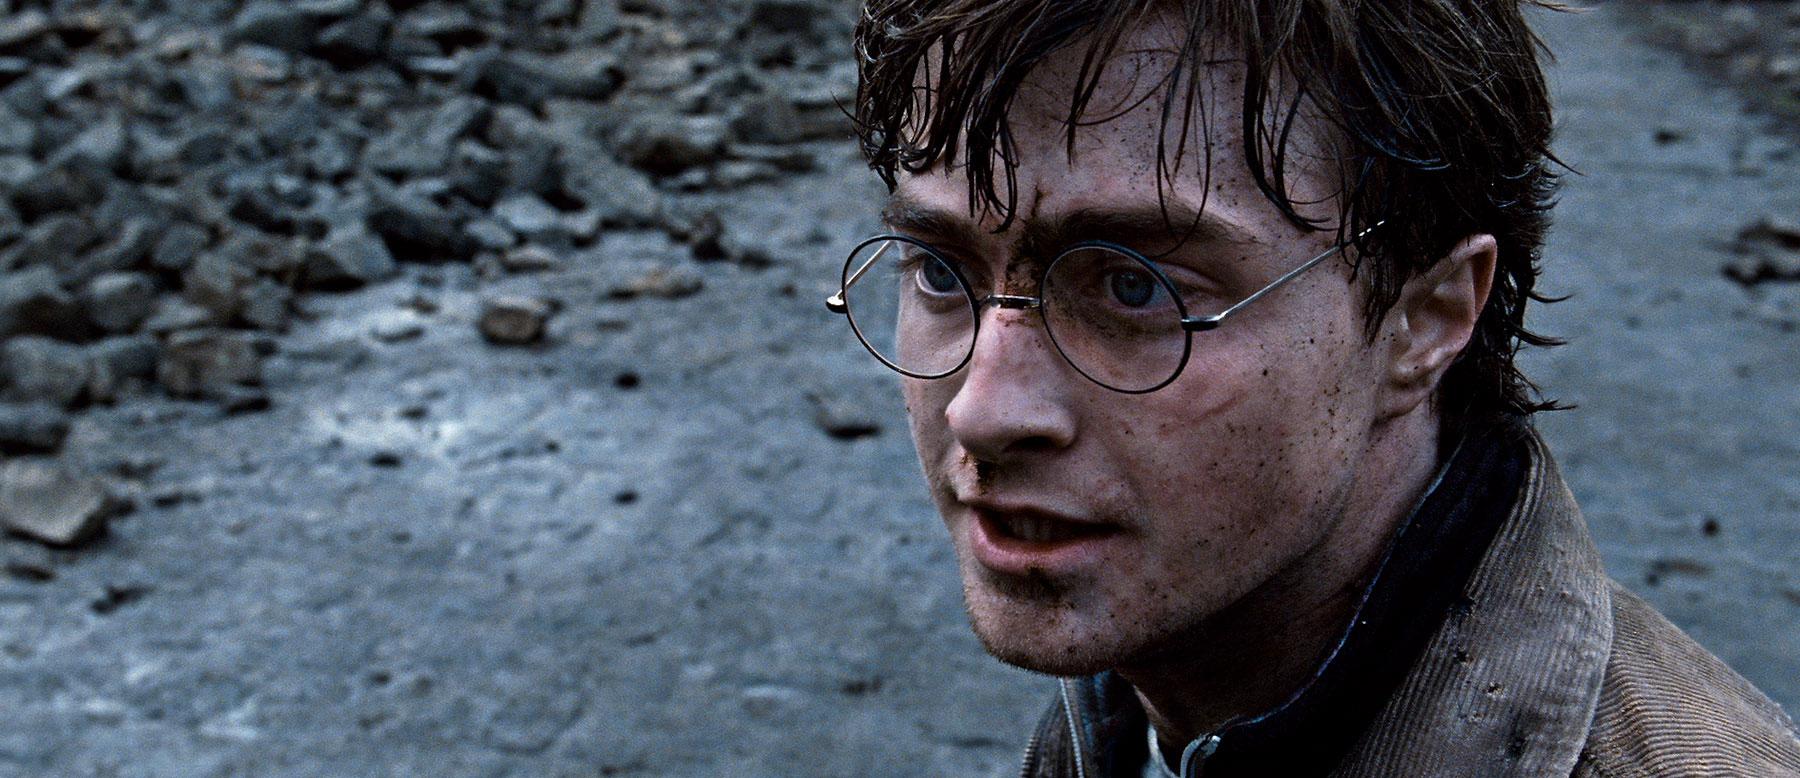 Top 250 фильмов IMDb Гарри Поттер и Дары смерти Часть II (Harry Potter and the Deathly Hallows Part 2) (2011)